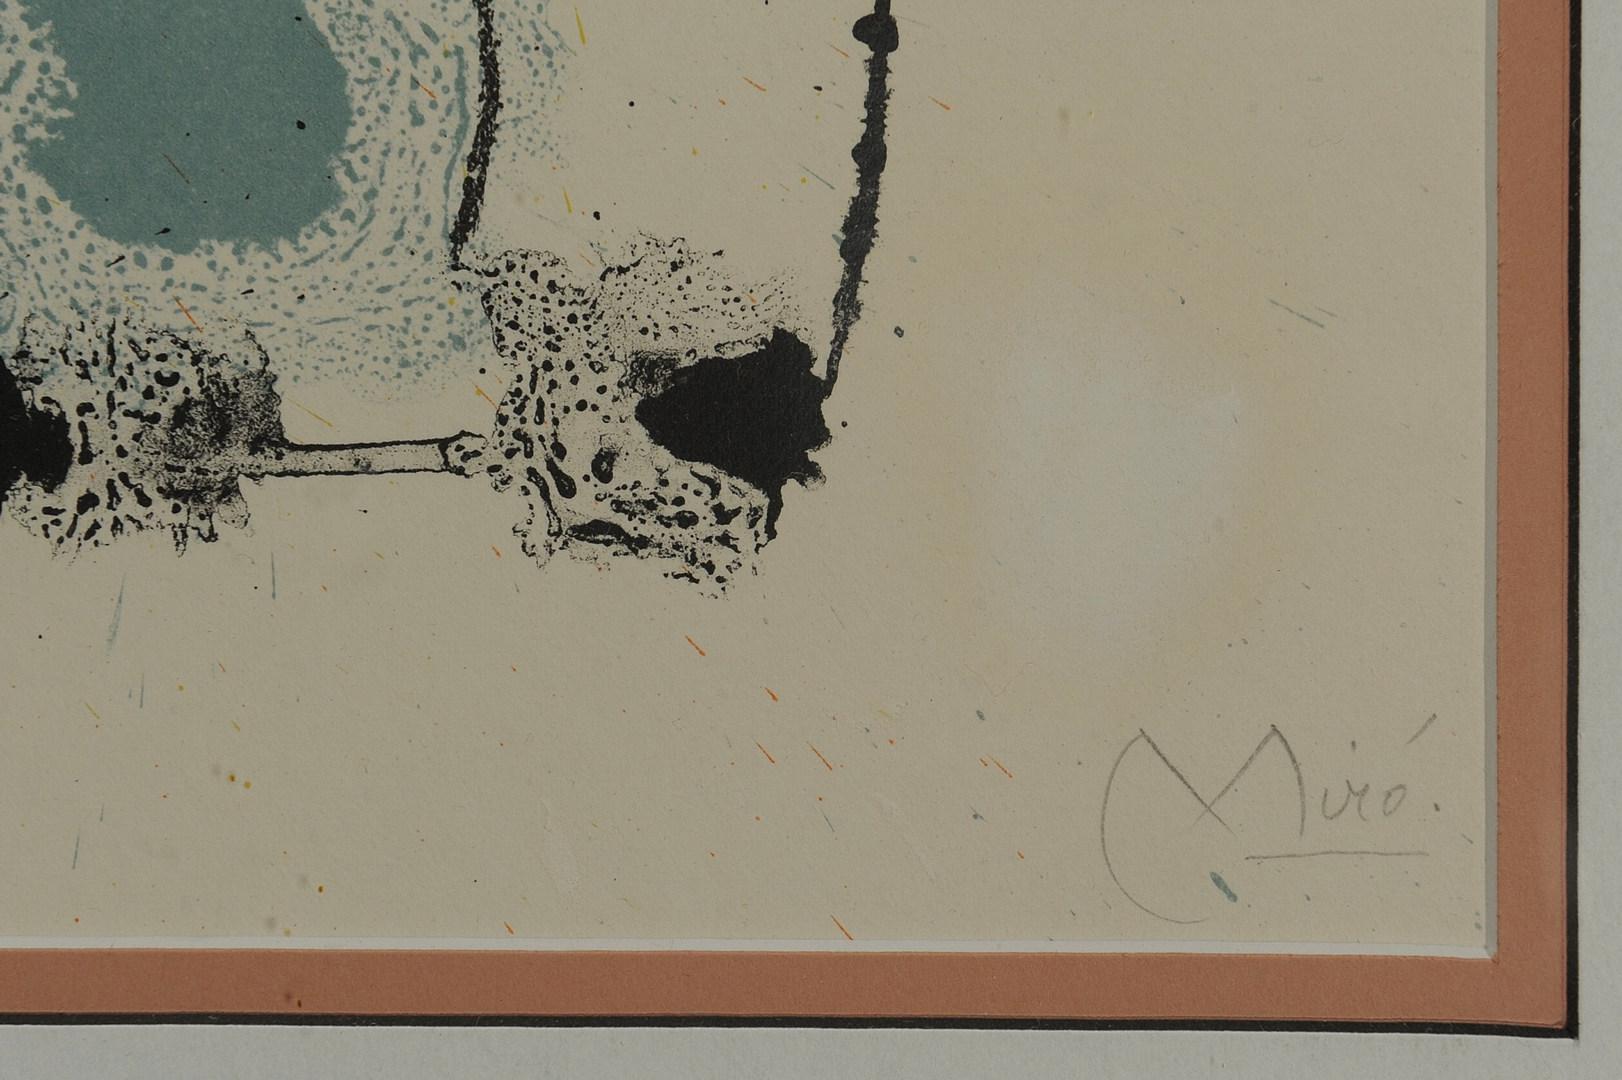 Lot 355: Joan Miro Lithograph (2 of 2)